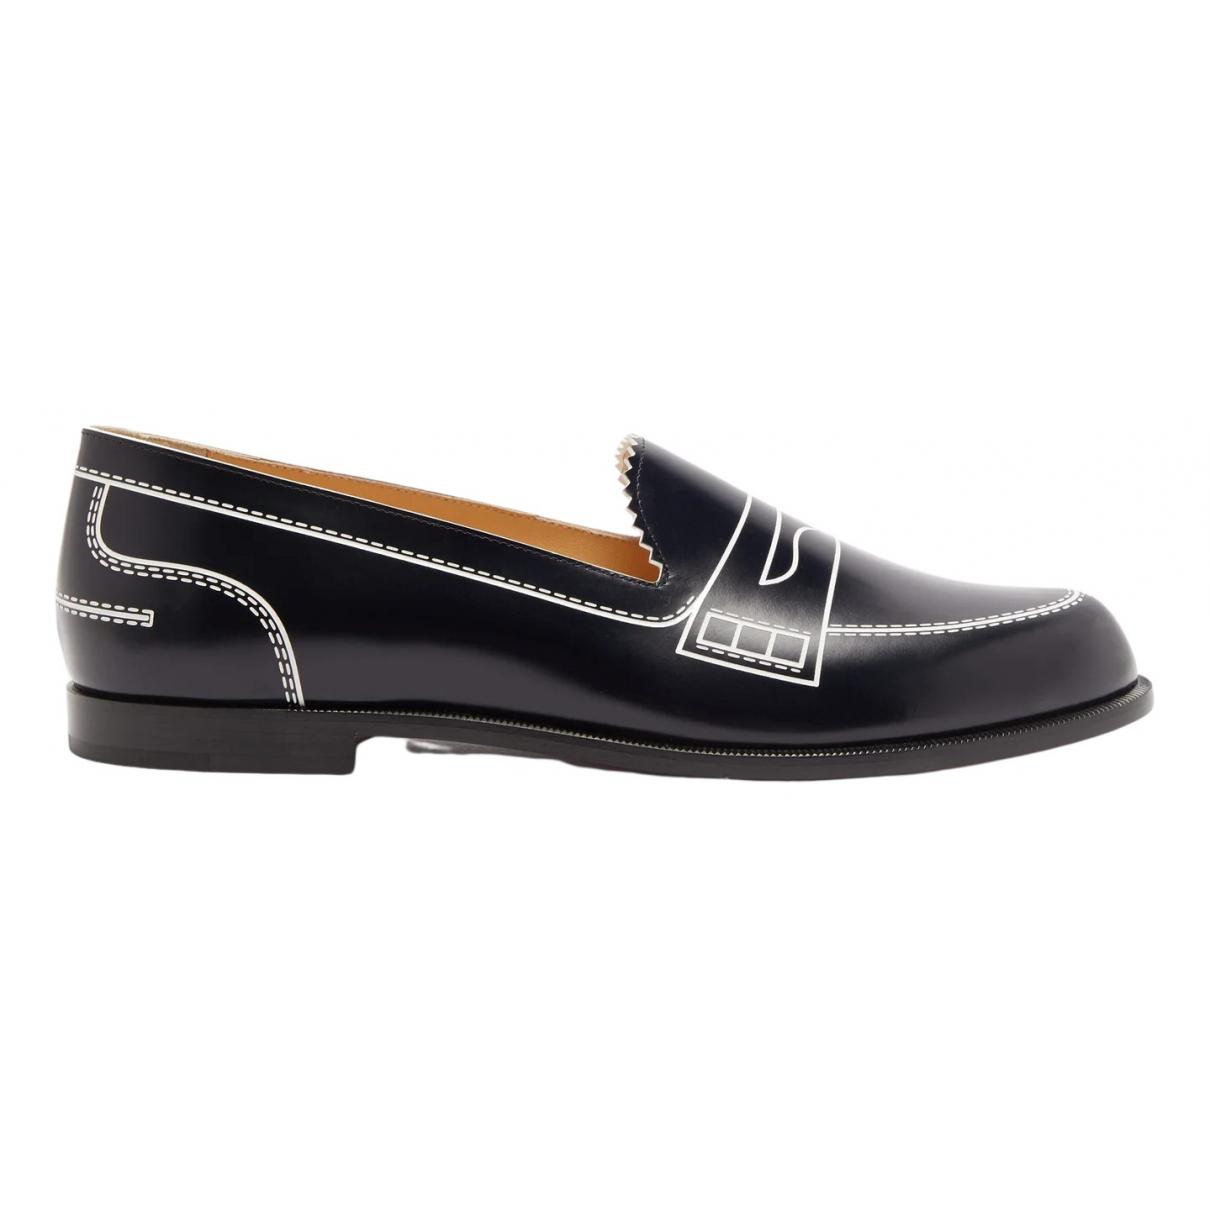 Christian Louboutin \N Black Leather Flats for Women 37 EU